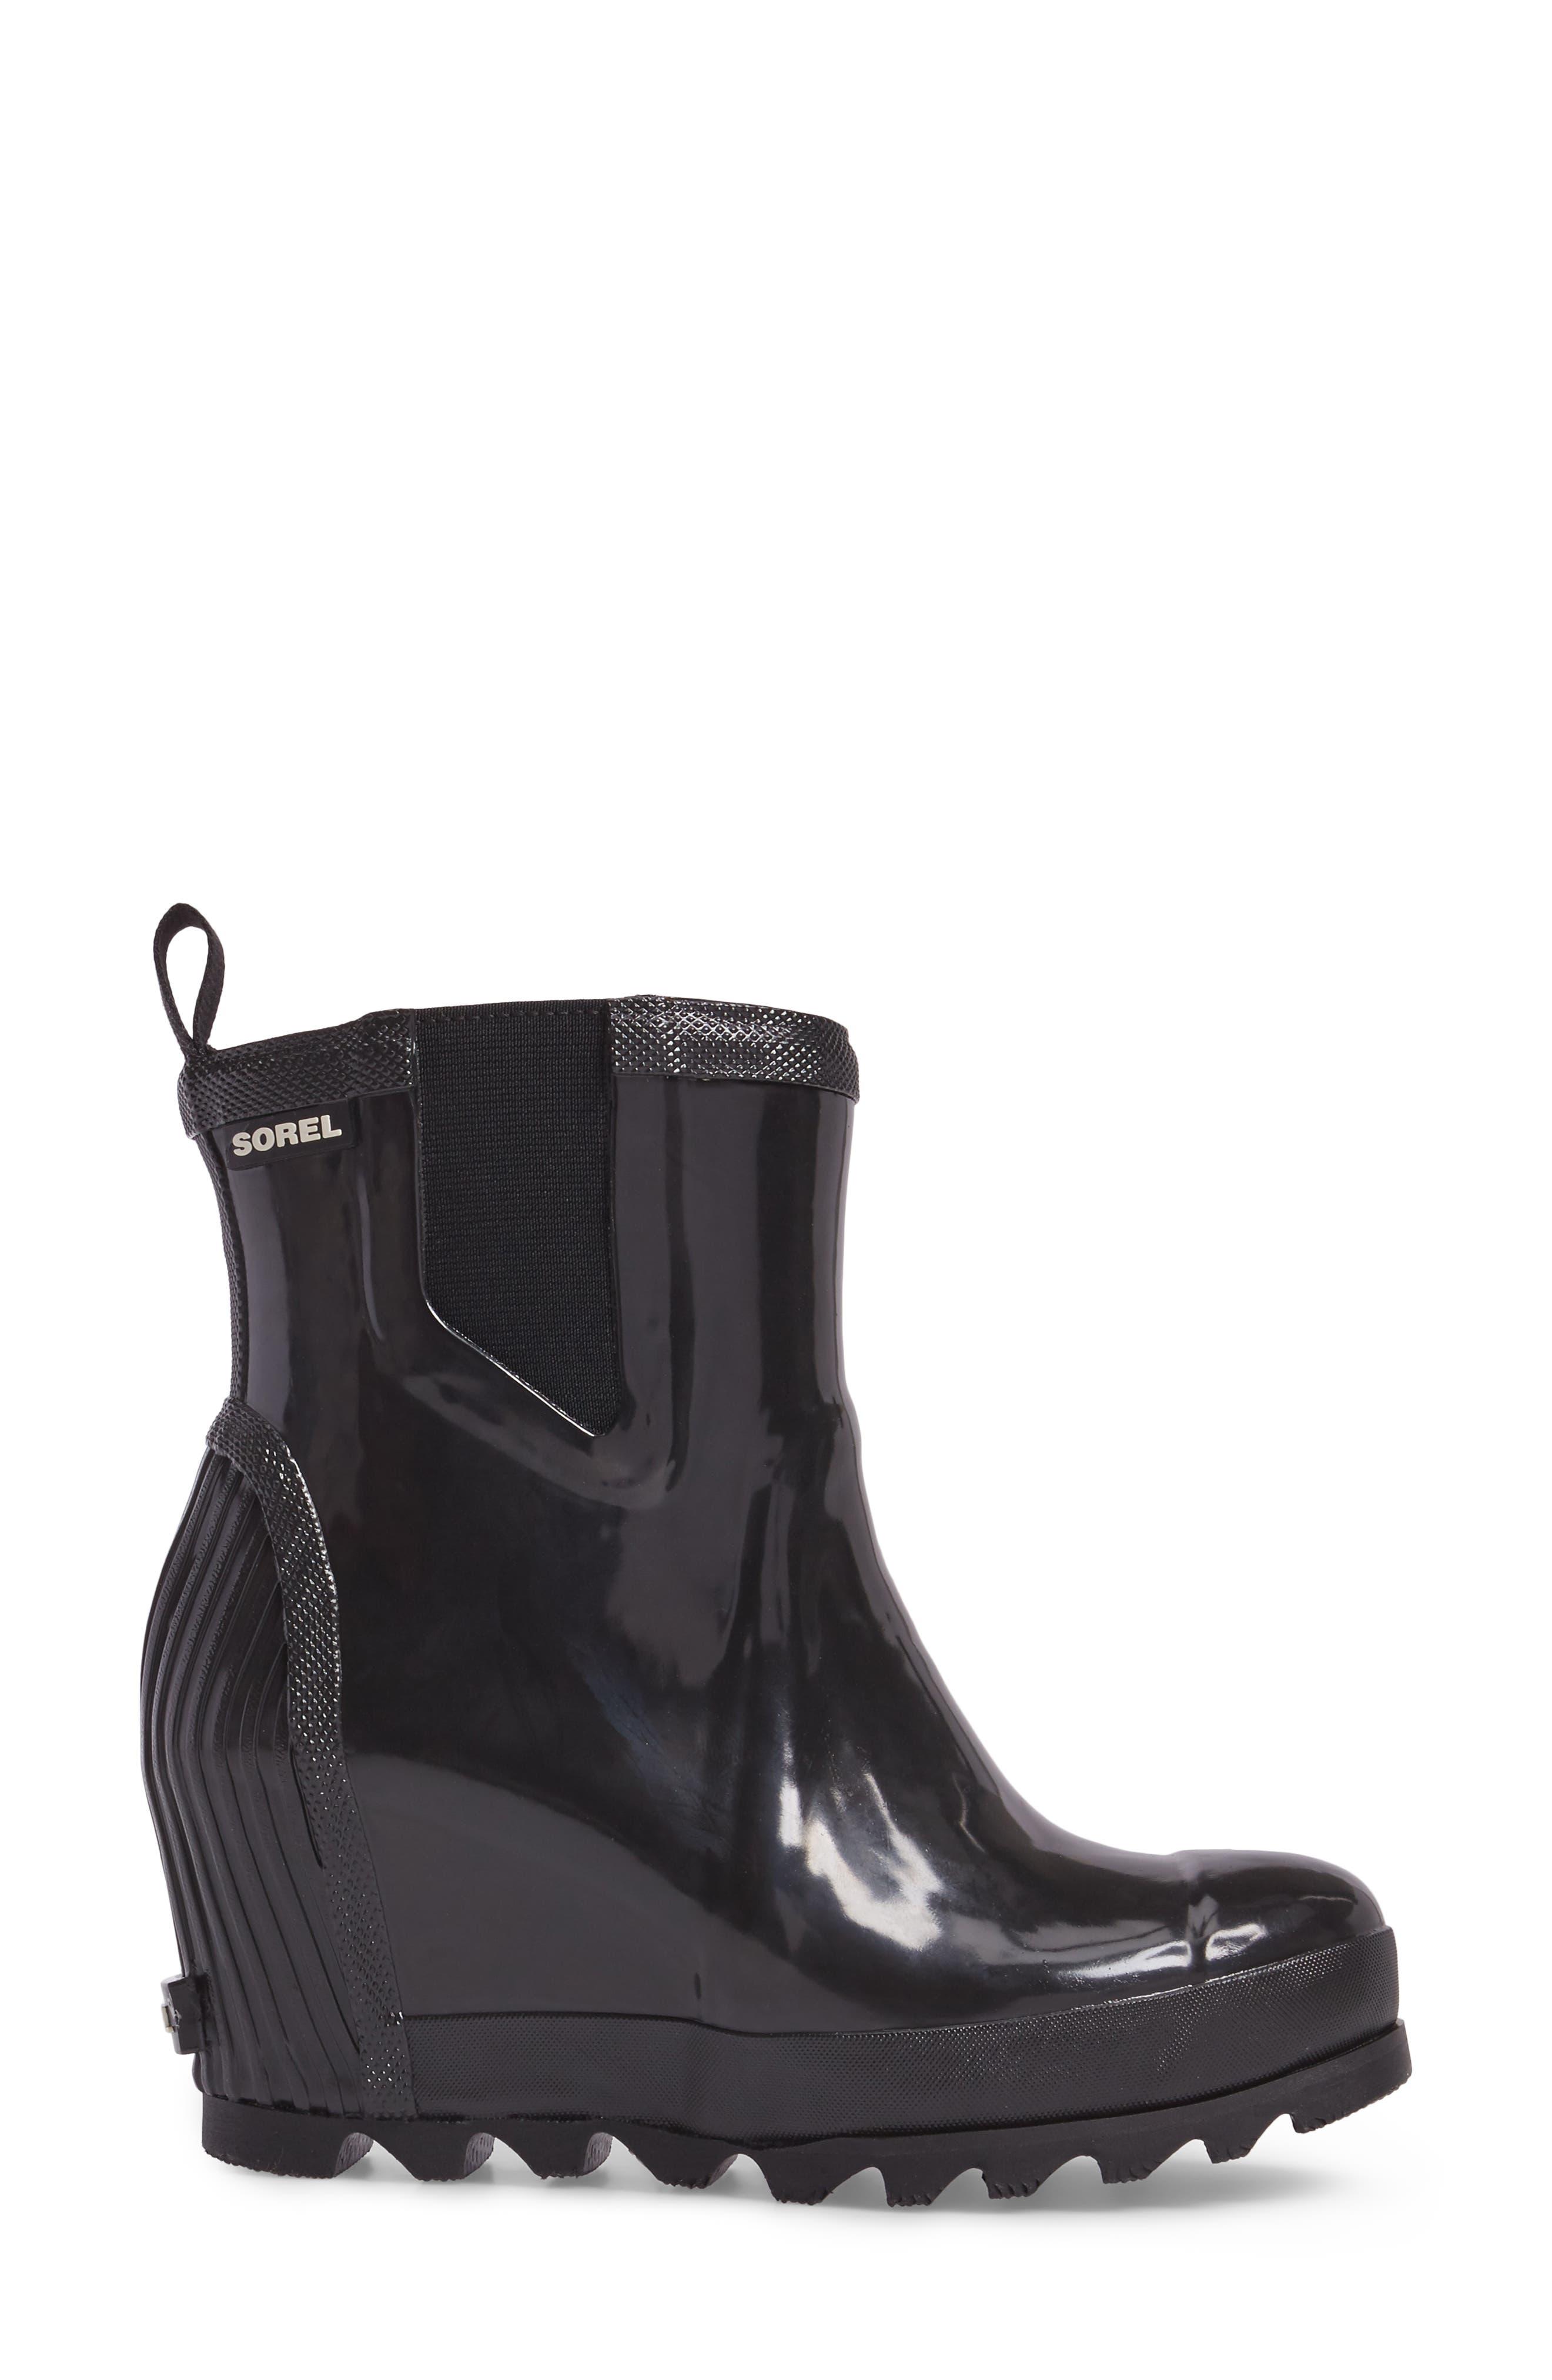 Joan Glossy Wedge Rain Boot,                             Alternate thumbnail 3, color,                             Black/ Sea Salt